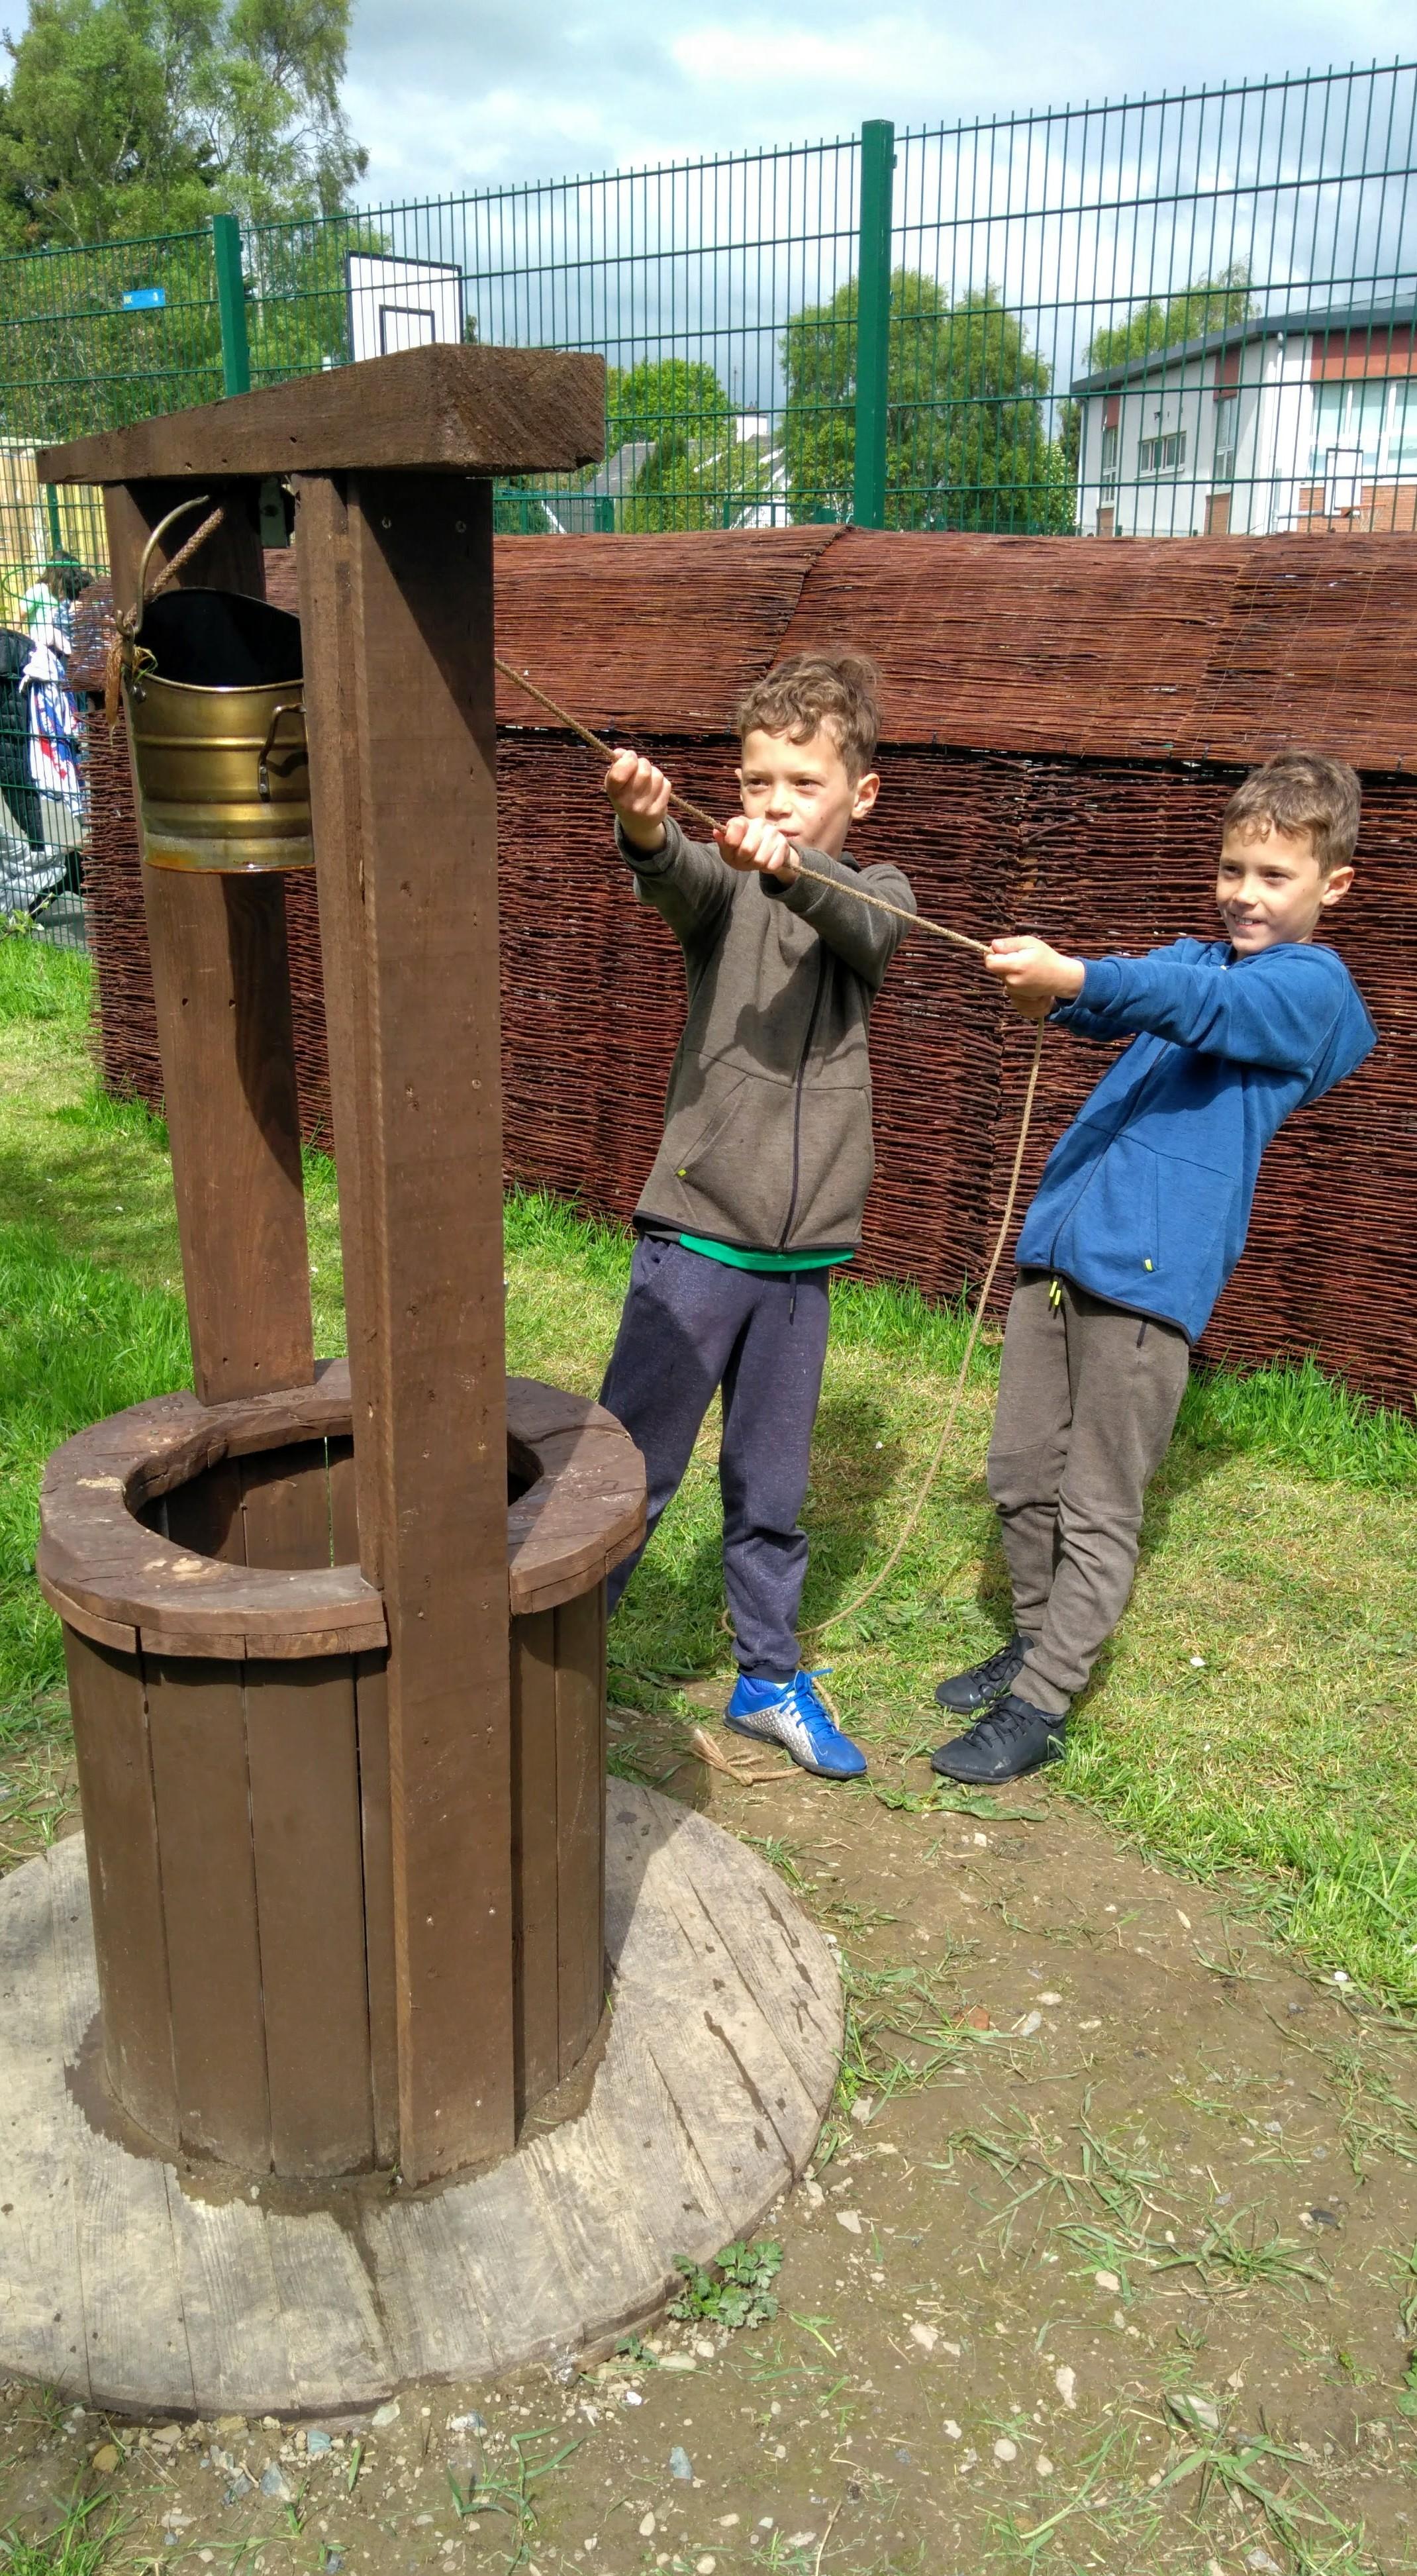 Swords ETNS Sensory Garden